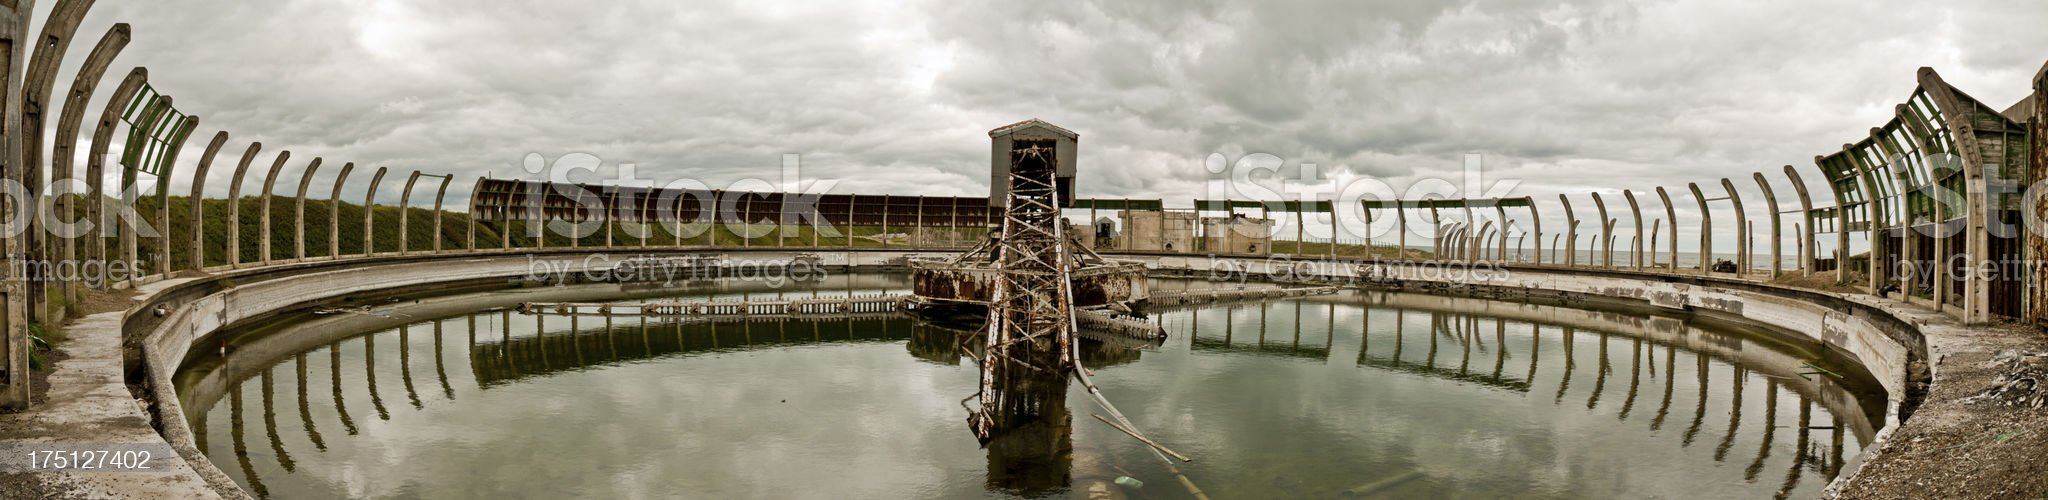 Abandoned Watertower royalty-free stock photo